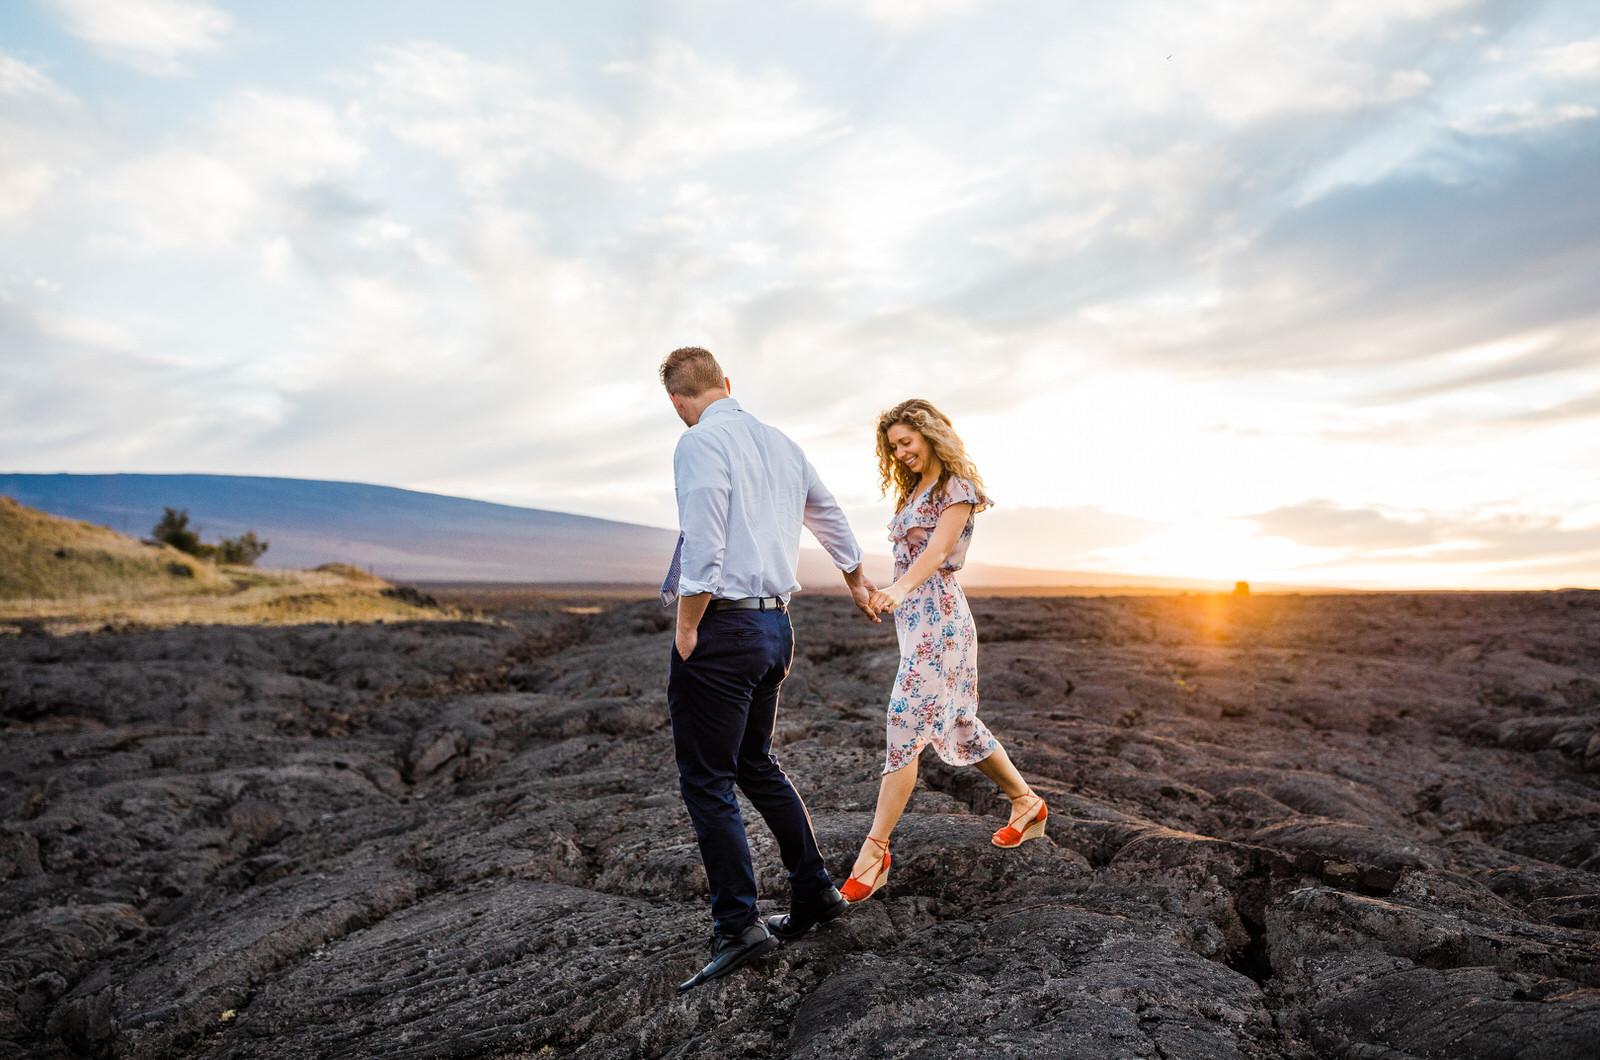 engagements-hilo-happy-couple-big-island-hawaii-15.jpg